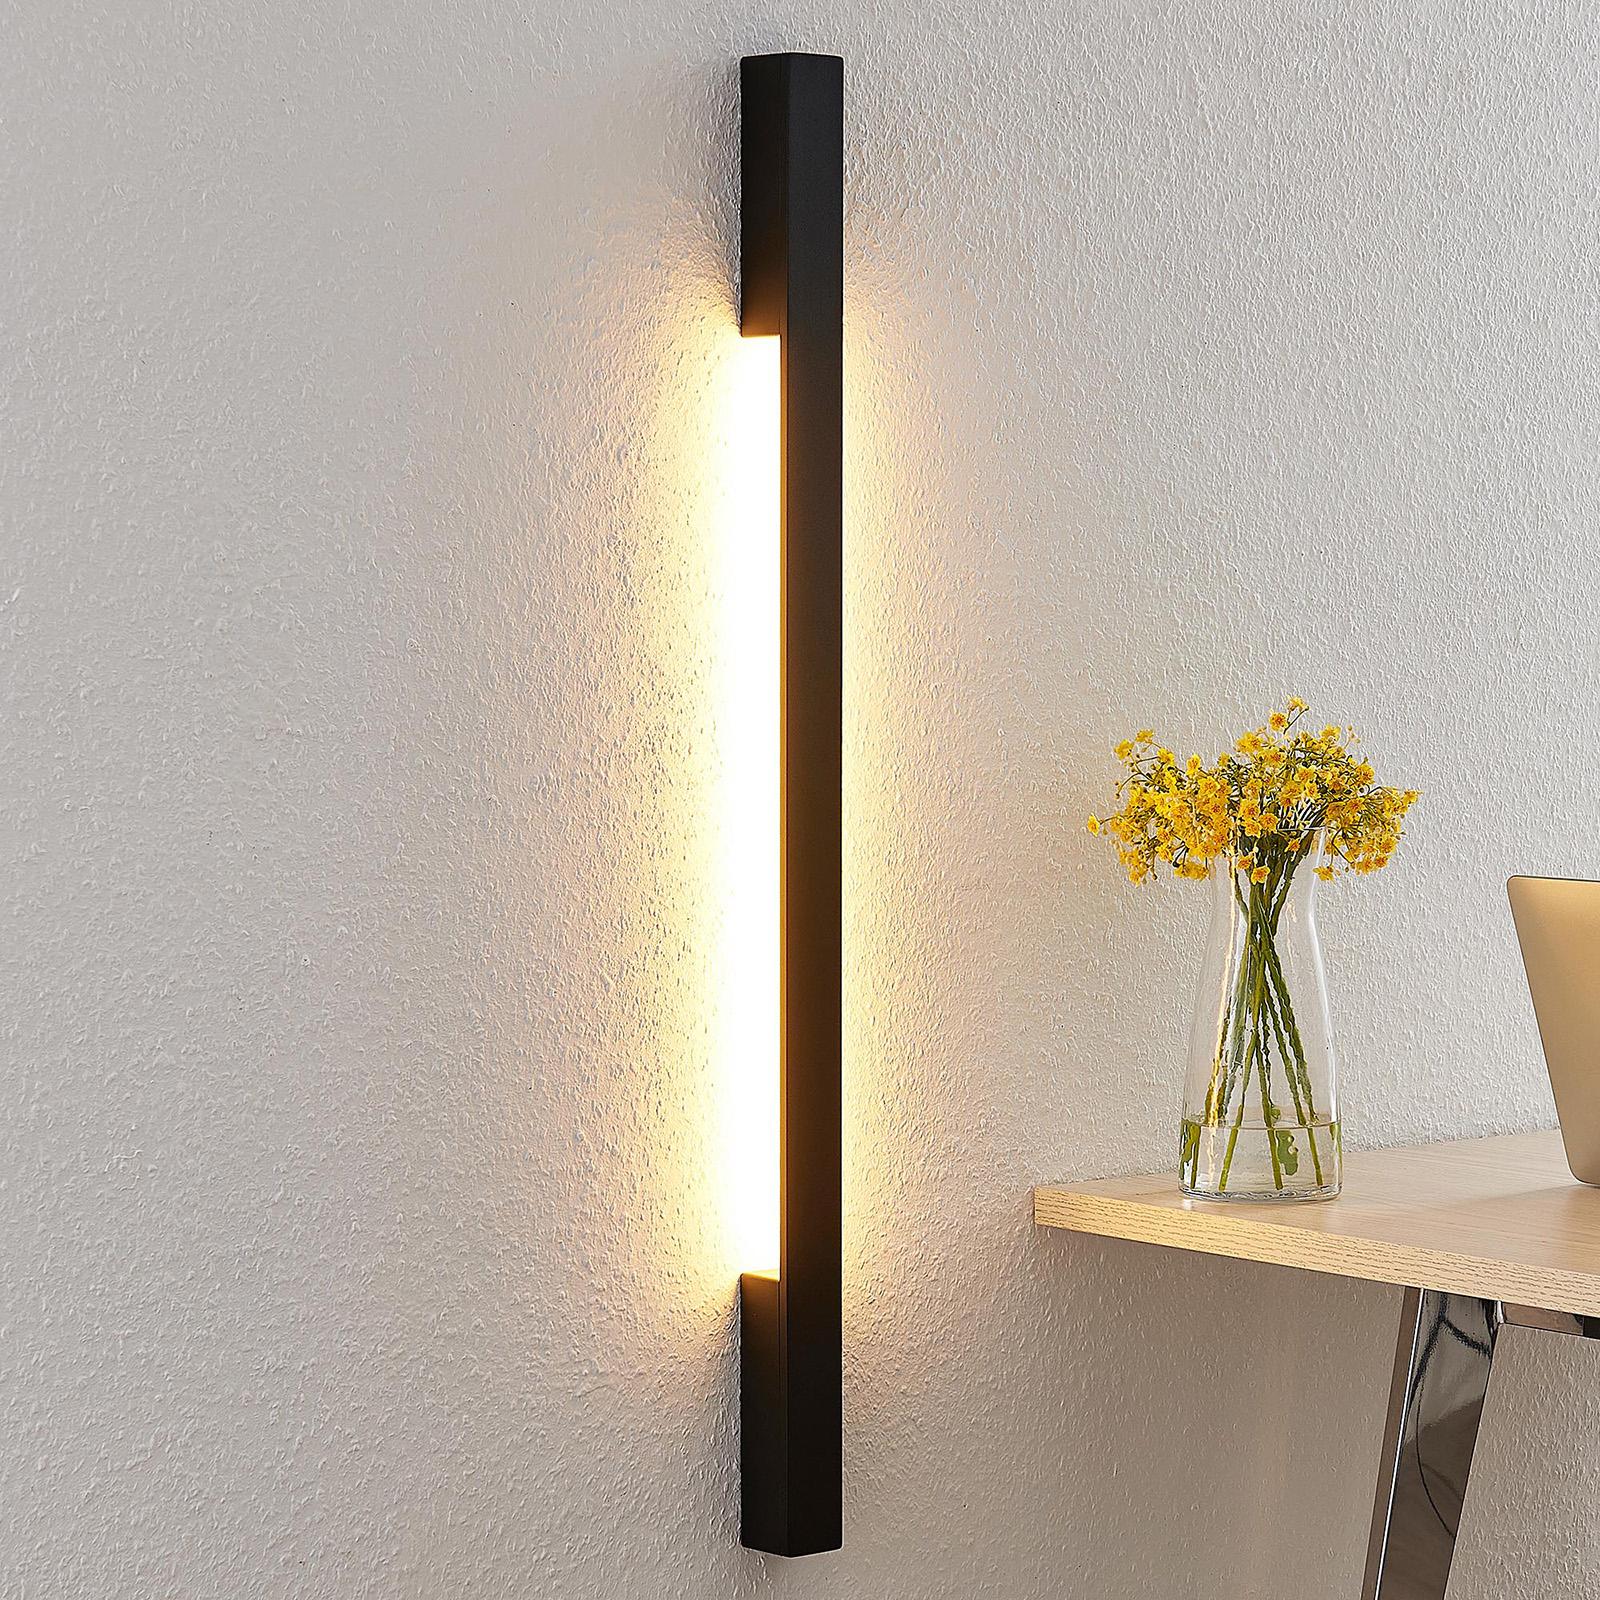 Arcchio Ivano LED-vegglampe, 91 cm, svart